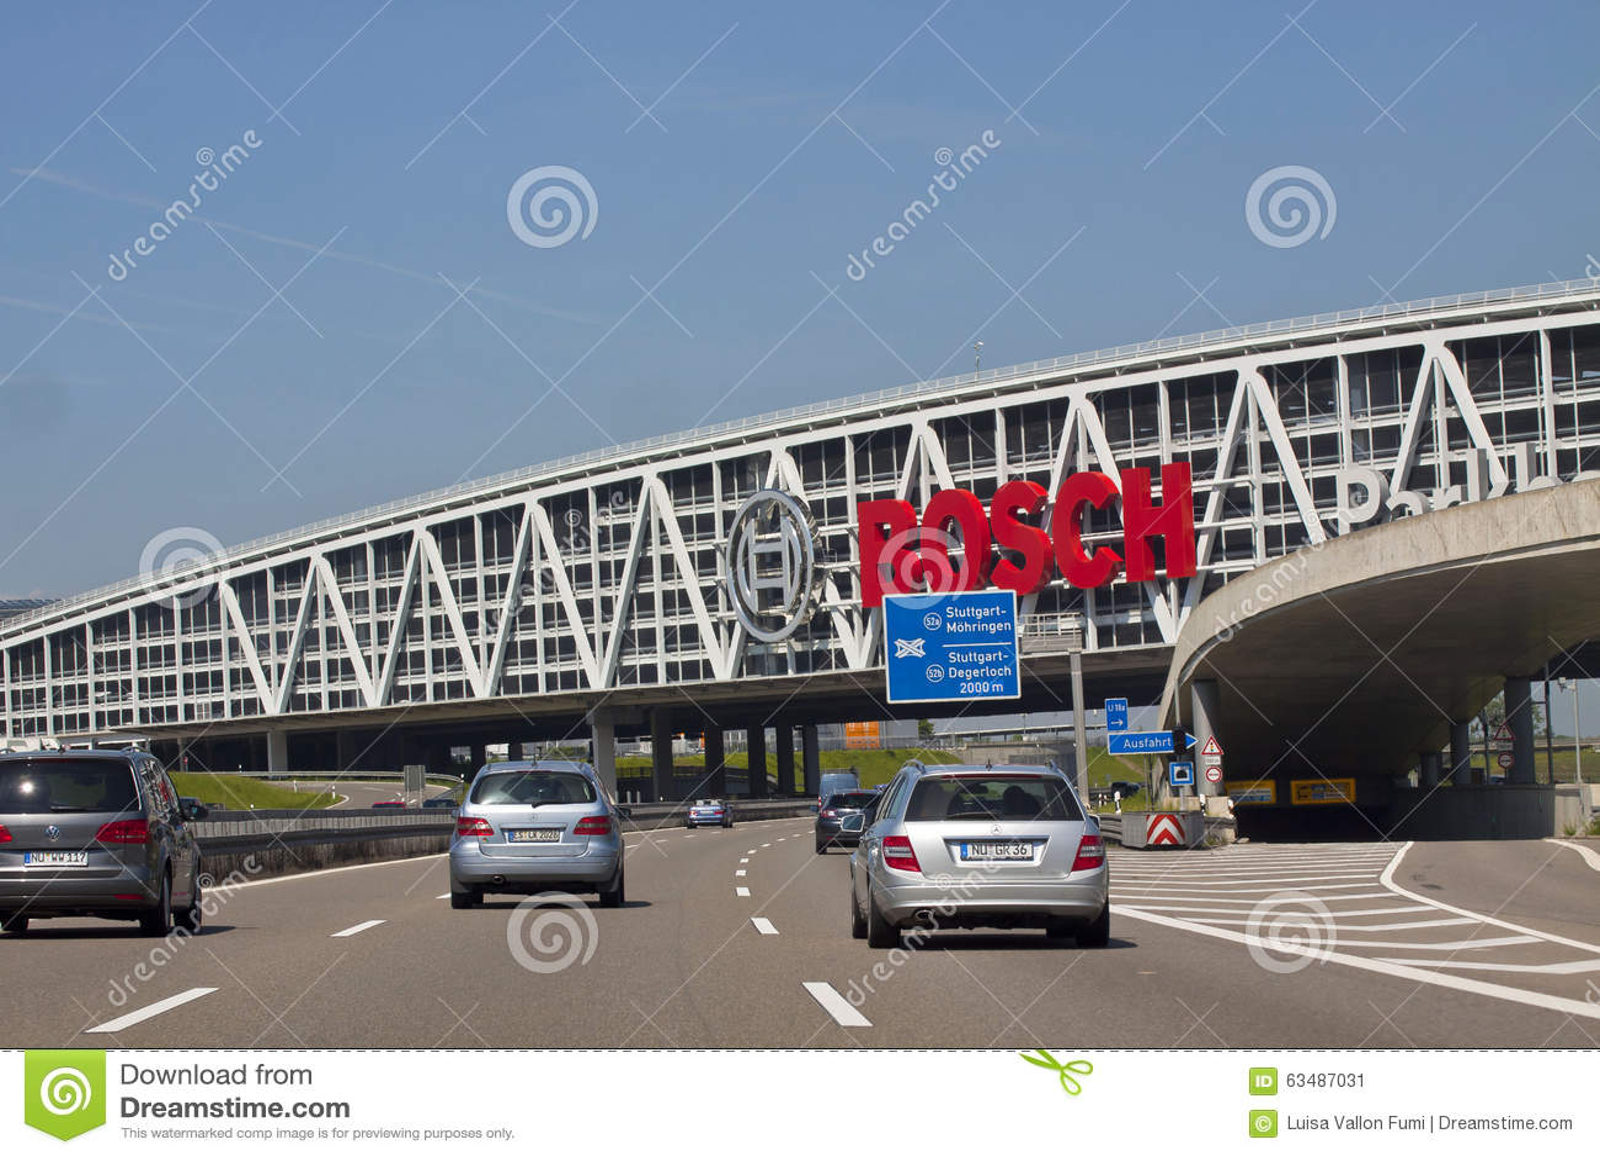 Stuttgart, Germany   Carpark Bridge Over A20 Highway with Bosch Ad ...